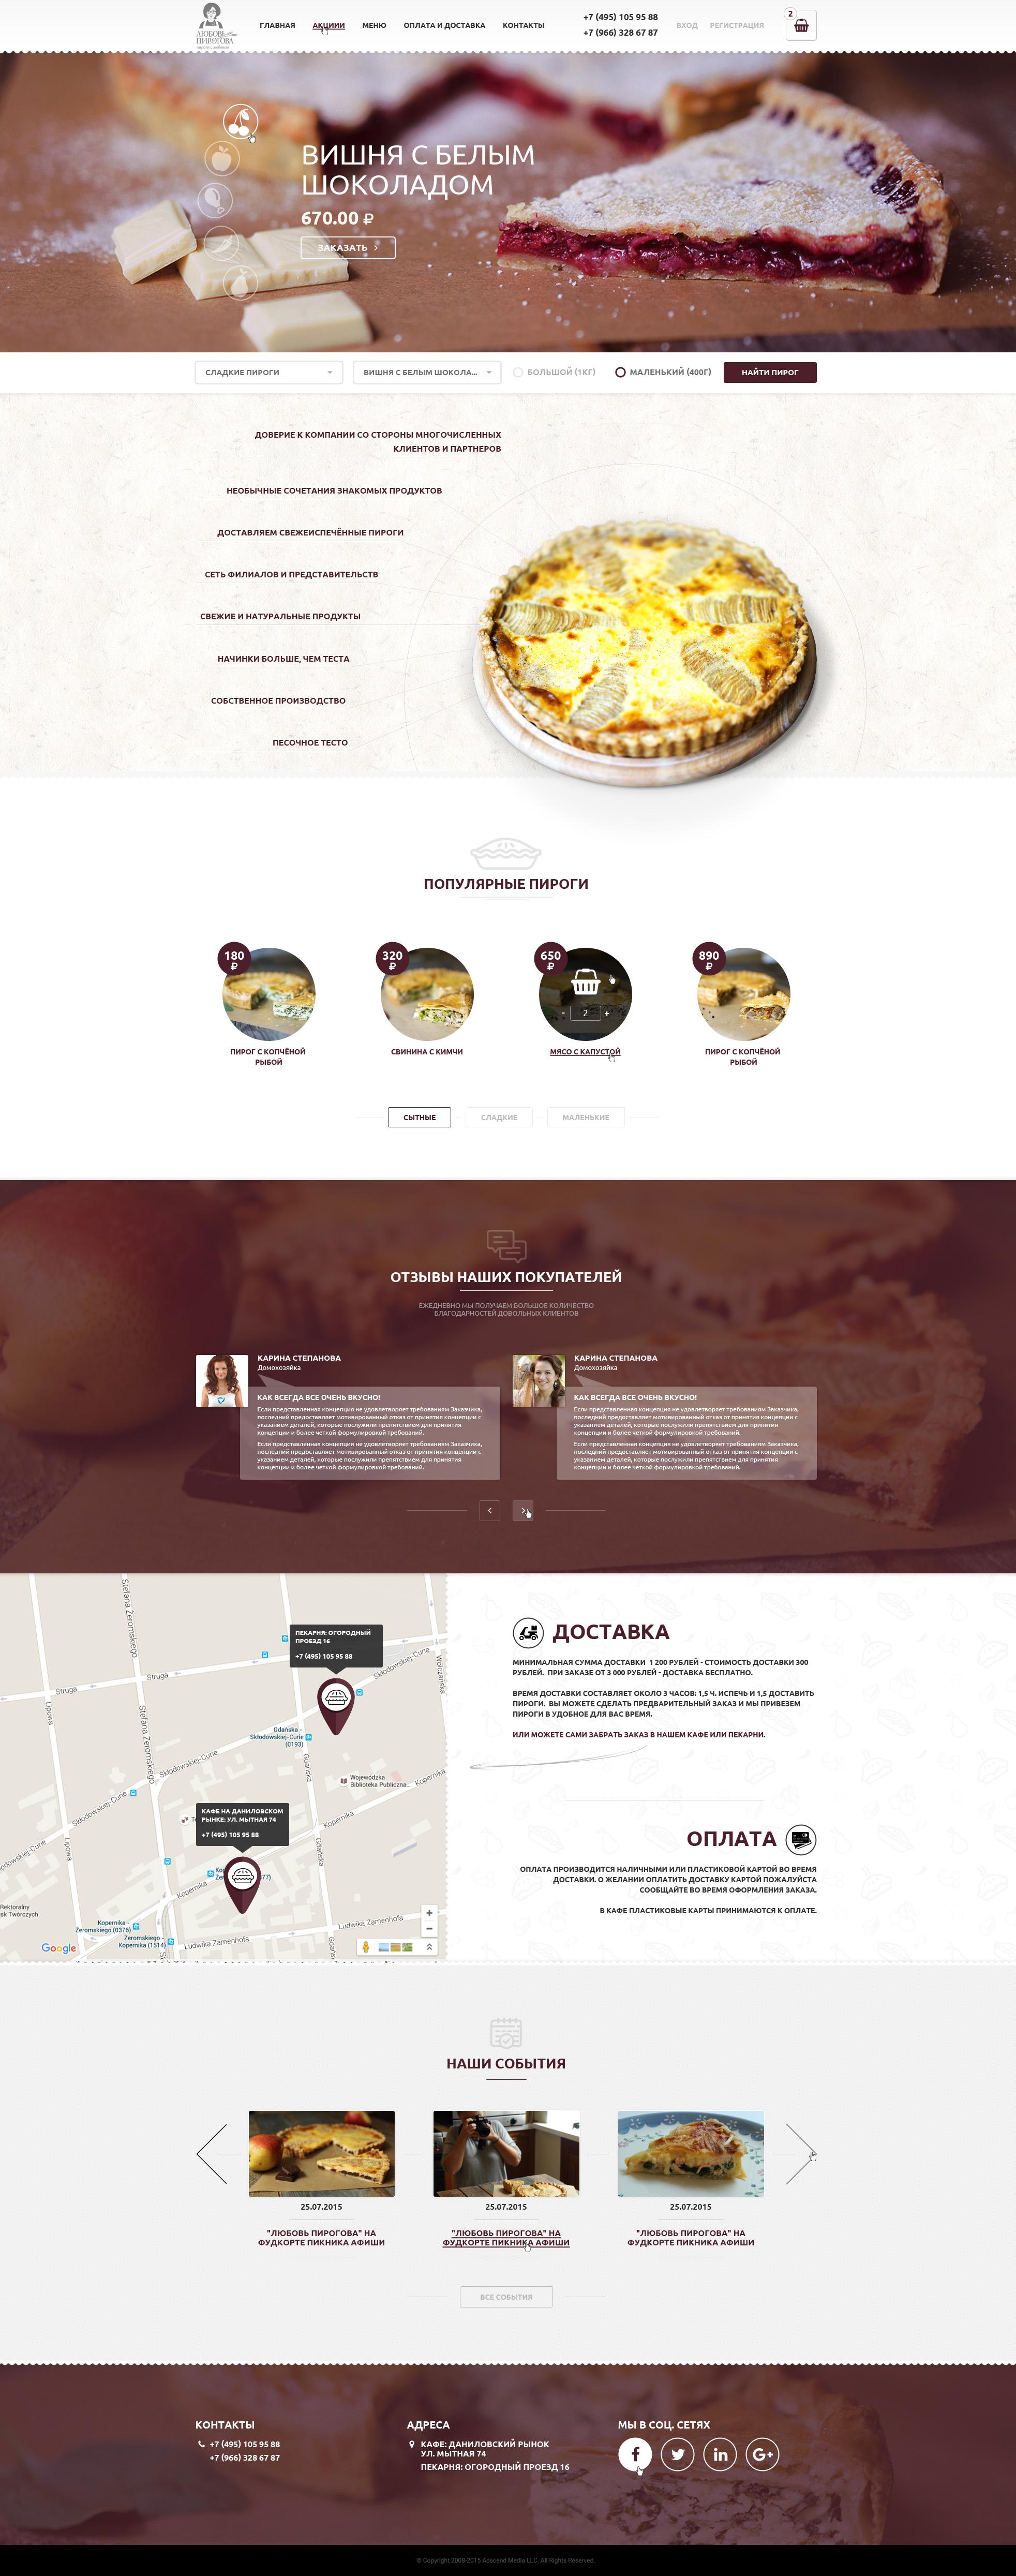 Разработка дизайна сайта lovepirogova.ru фото f_04156b66babbca93.jpg